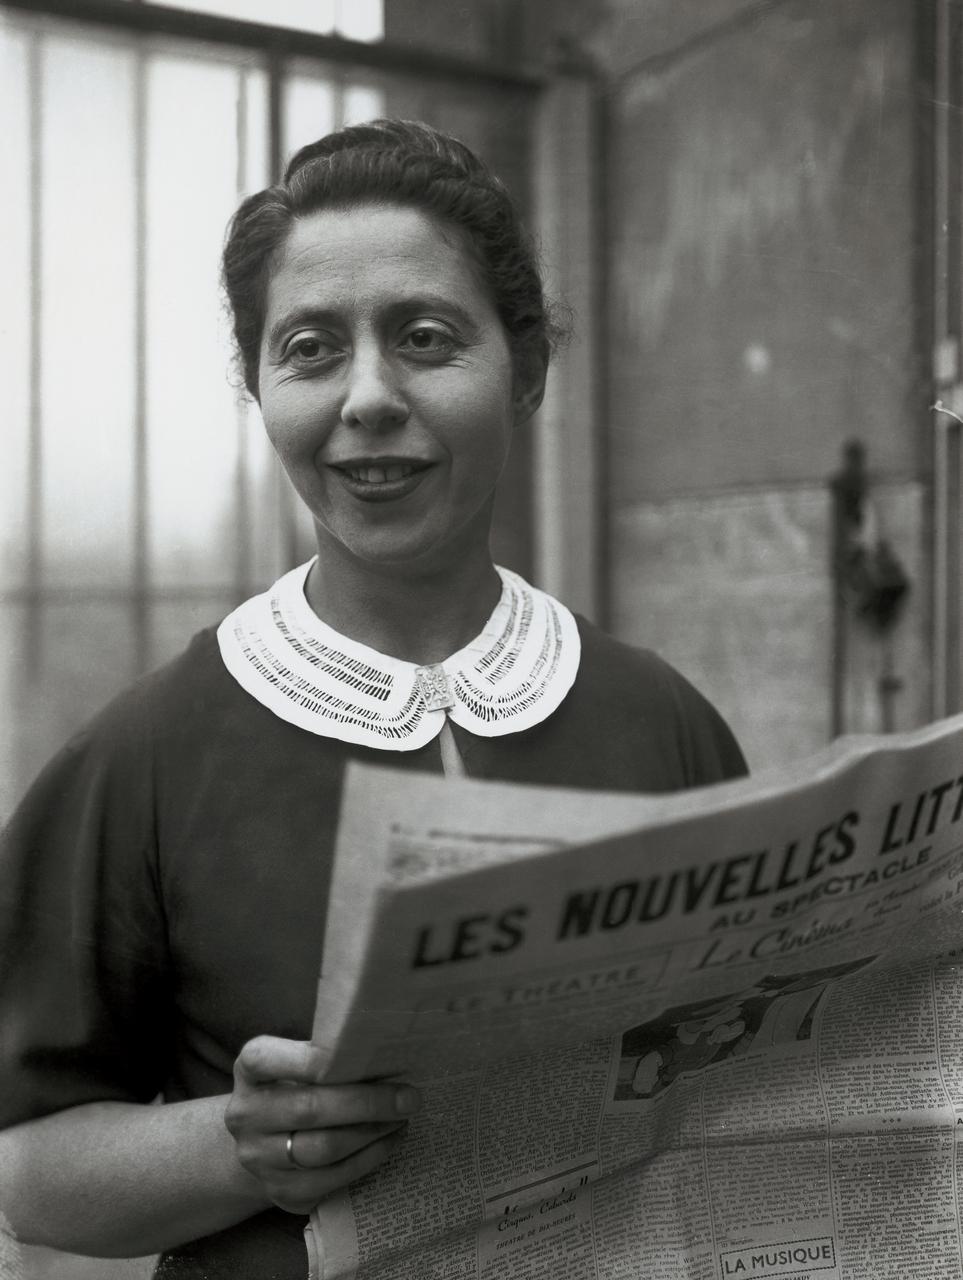 image for Némirovsky, Irène (1903-1942)